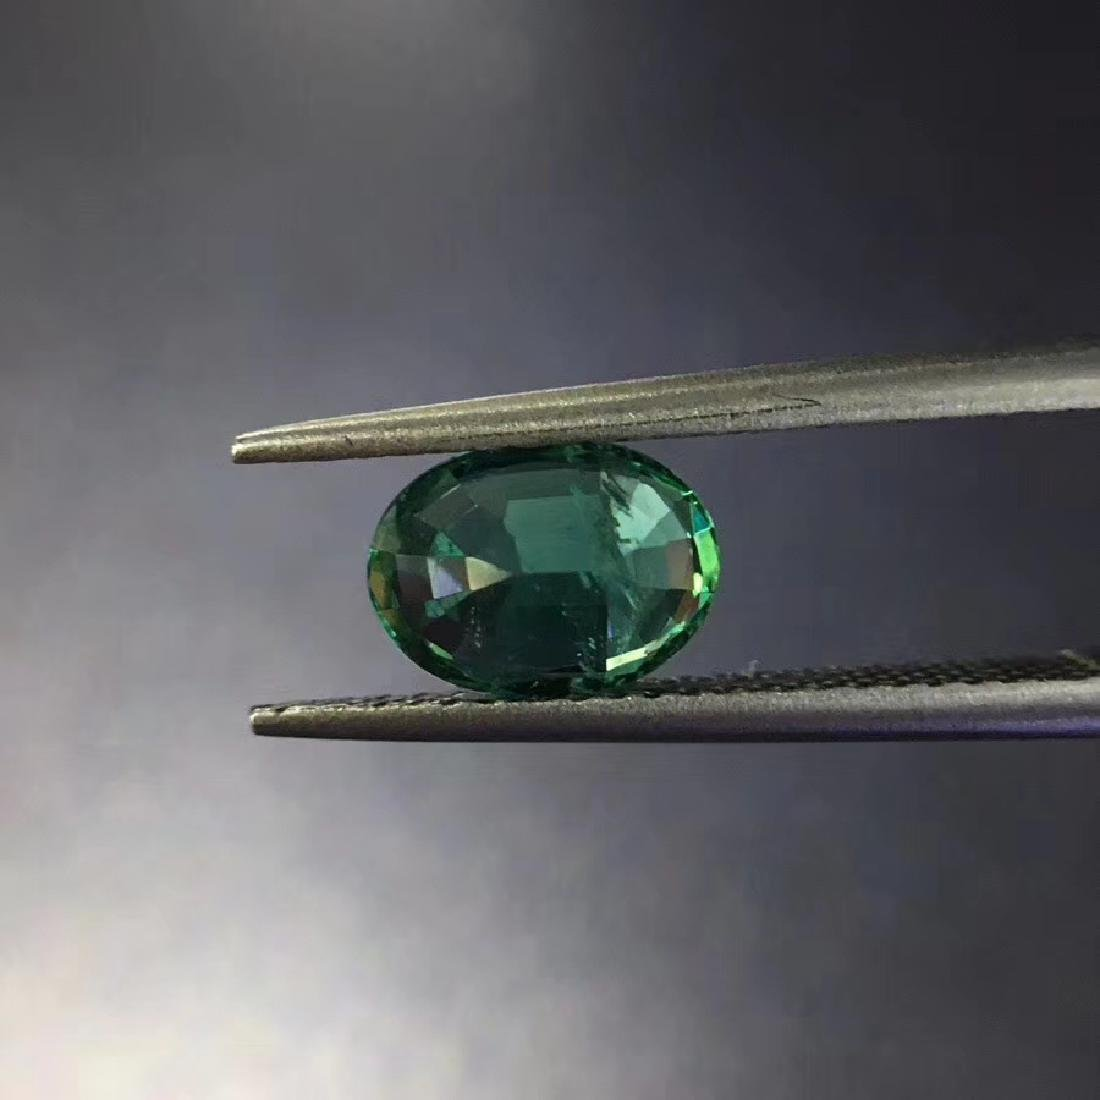 1.28 ct Emerald 6.0*8.1 mm Oval Cut - 4